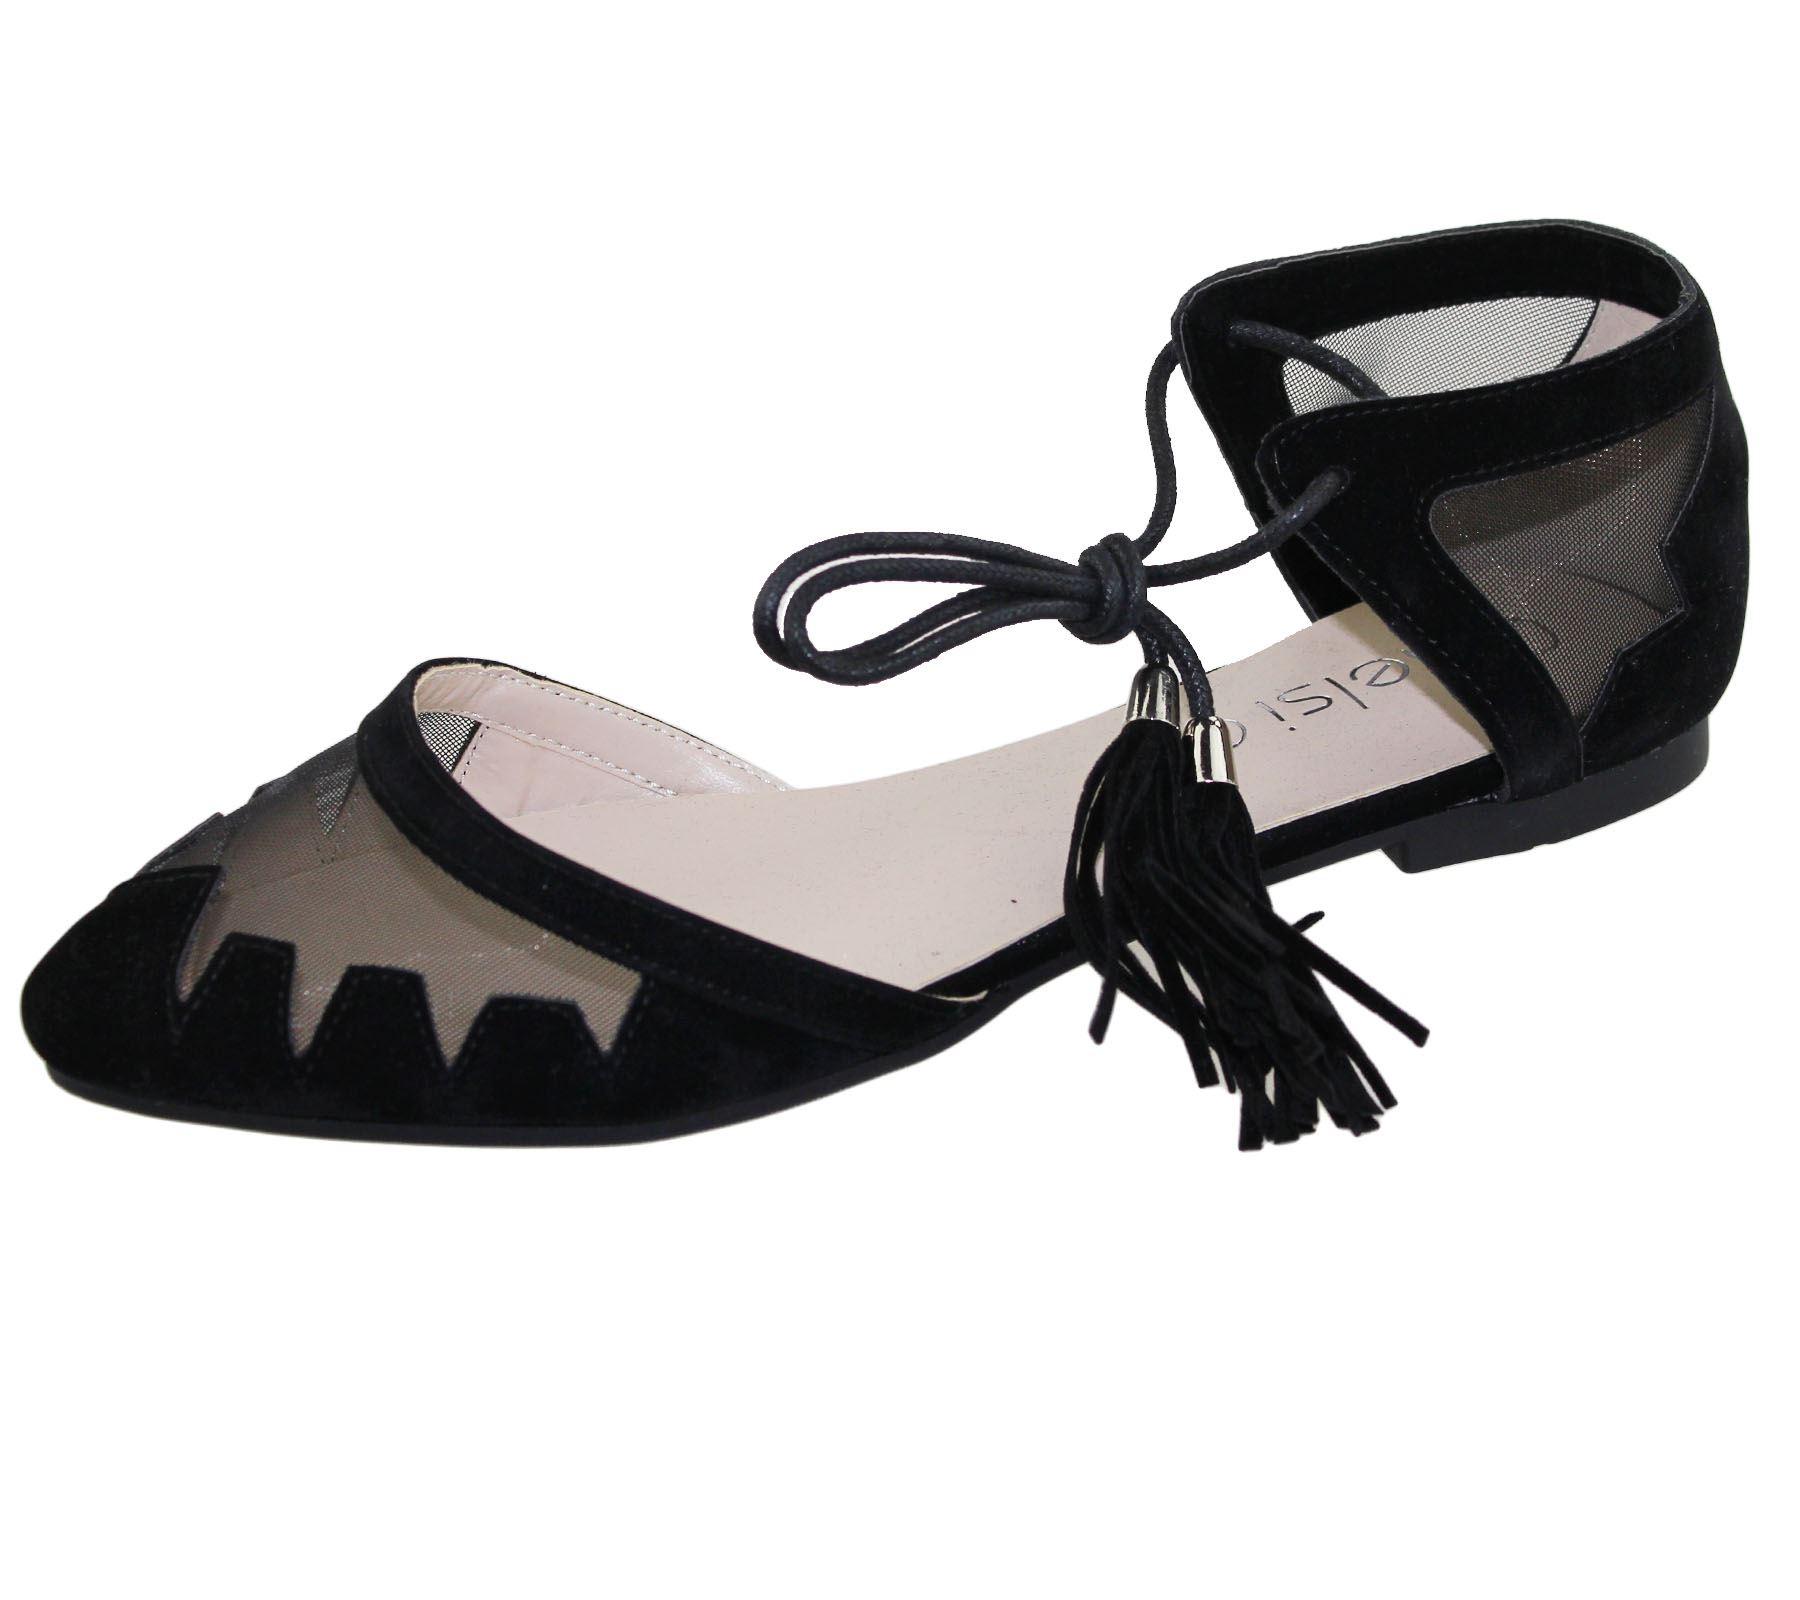 Womens-Flat-Ballerina-Dolly-Pumps-Ballet-Ladies-Summer-Mesh-Tassel-Shoes-Sandals thumbnail 37